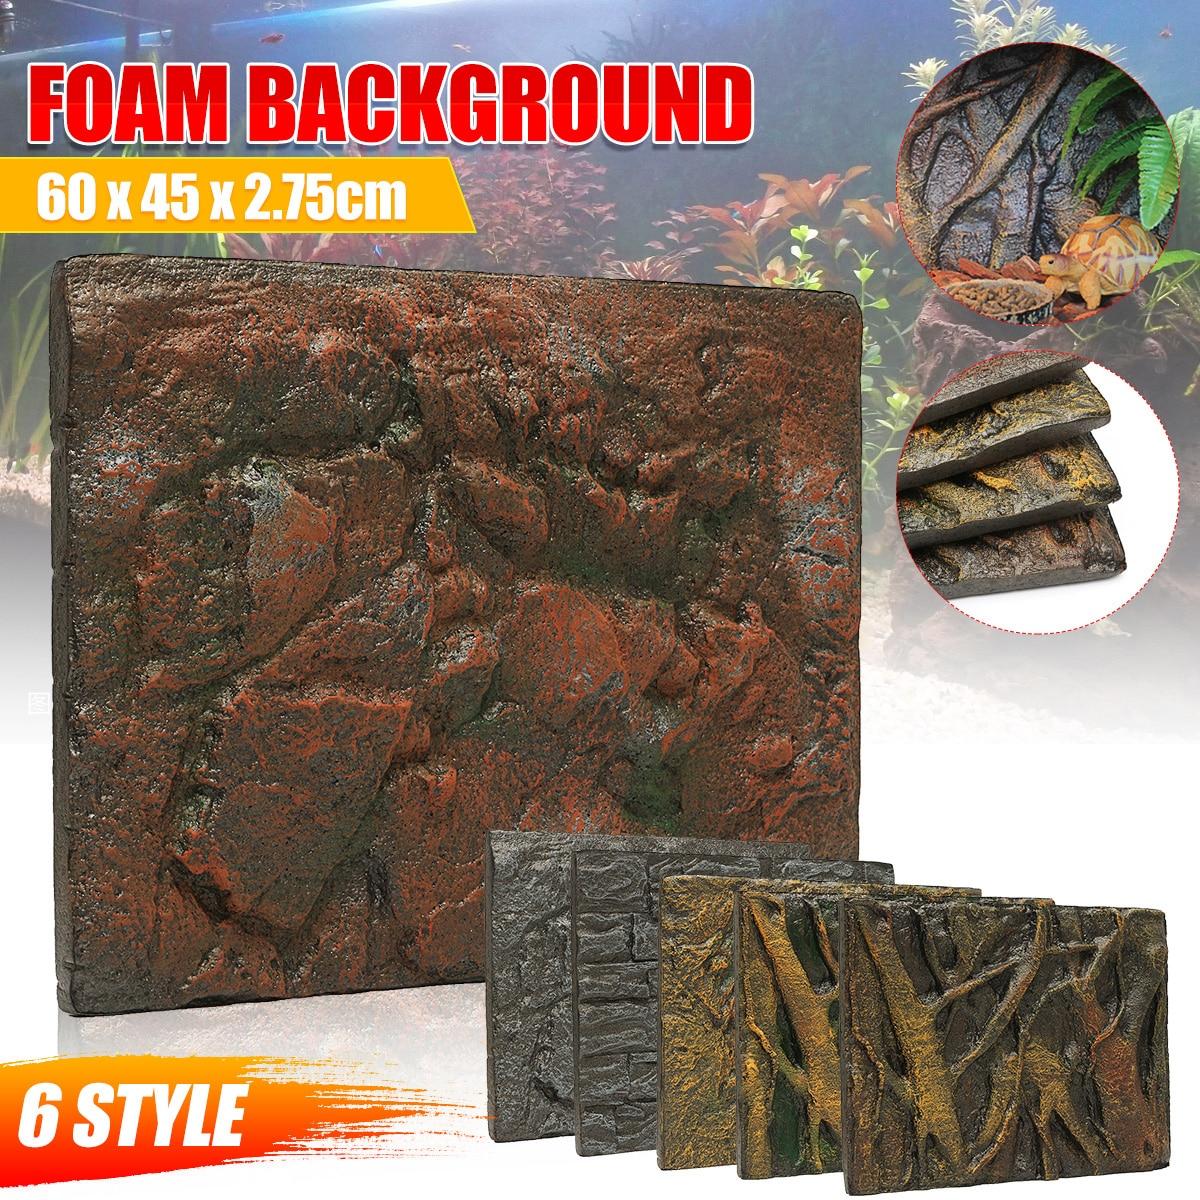 6 Types 3D Foam Rock Reptile Stone Aquarium Background Backdrop Fish Tank Board Decor Wholesale PU Leather Foam 60x45x3cm